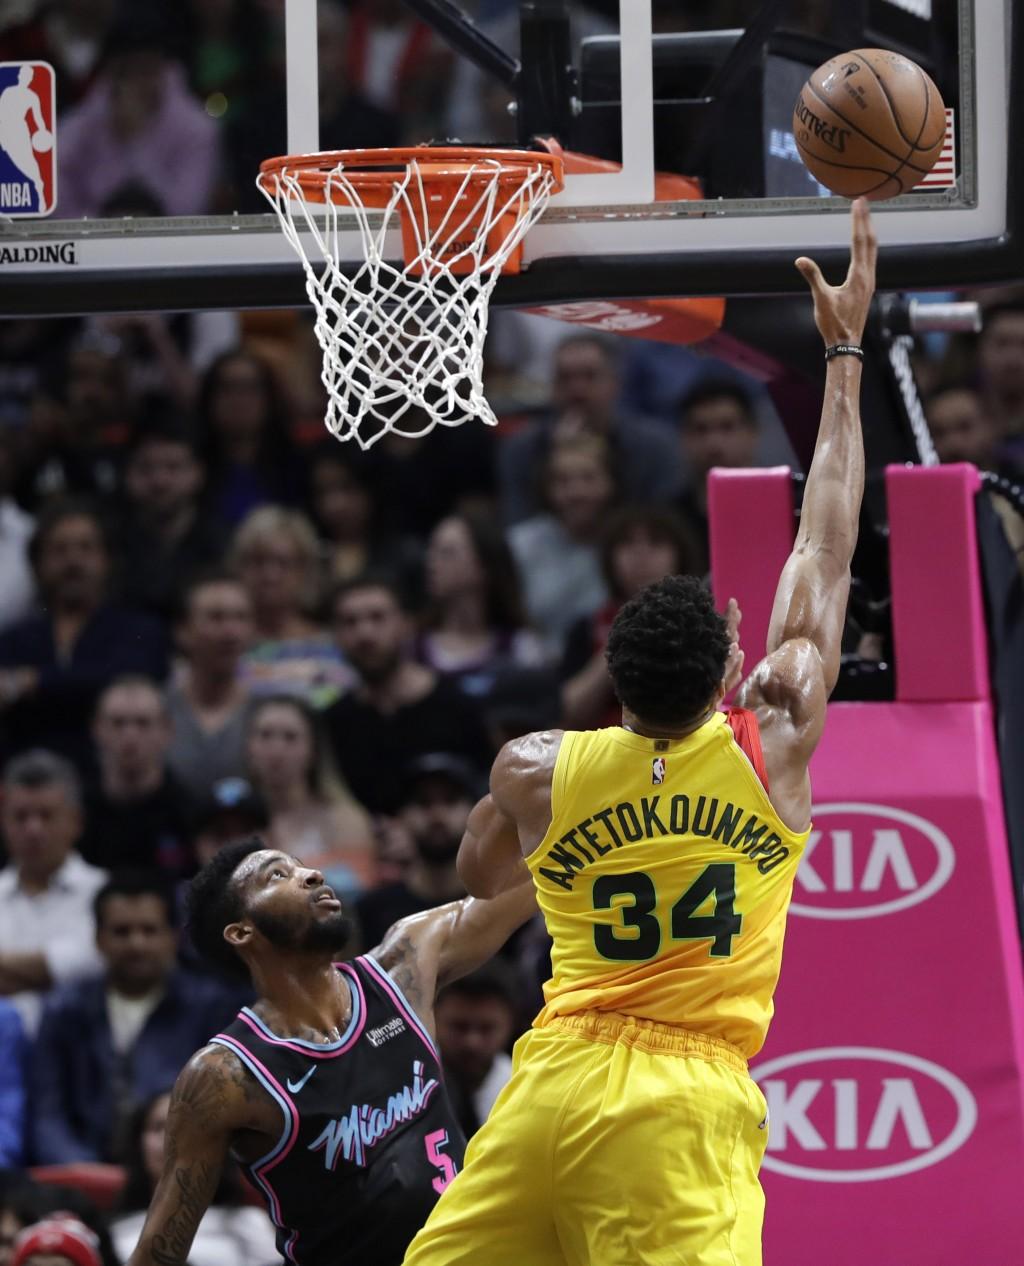 Milwaukee Bucks forward Giannis Antetokounmpo (34) shoots and is fouled by Miami Heat forward Derrick Jones Jr. (5) during the first half of an NBA ba...